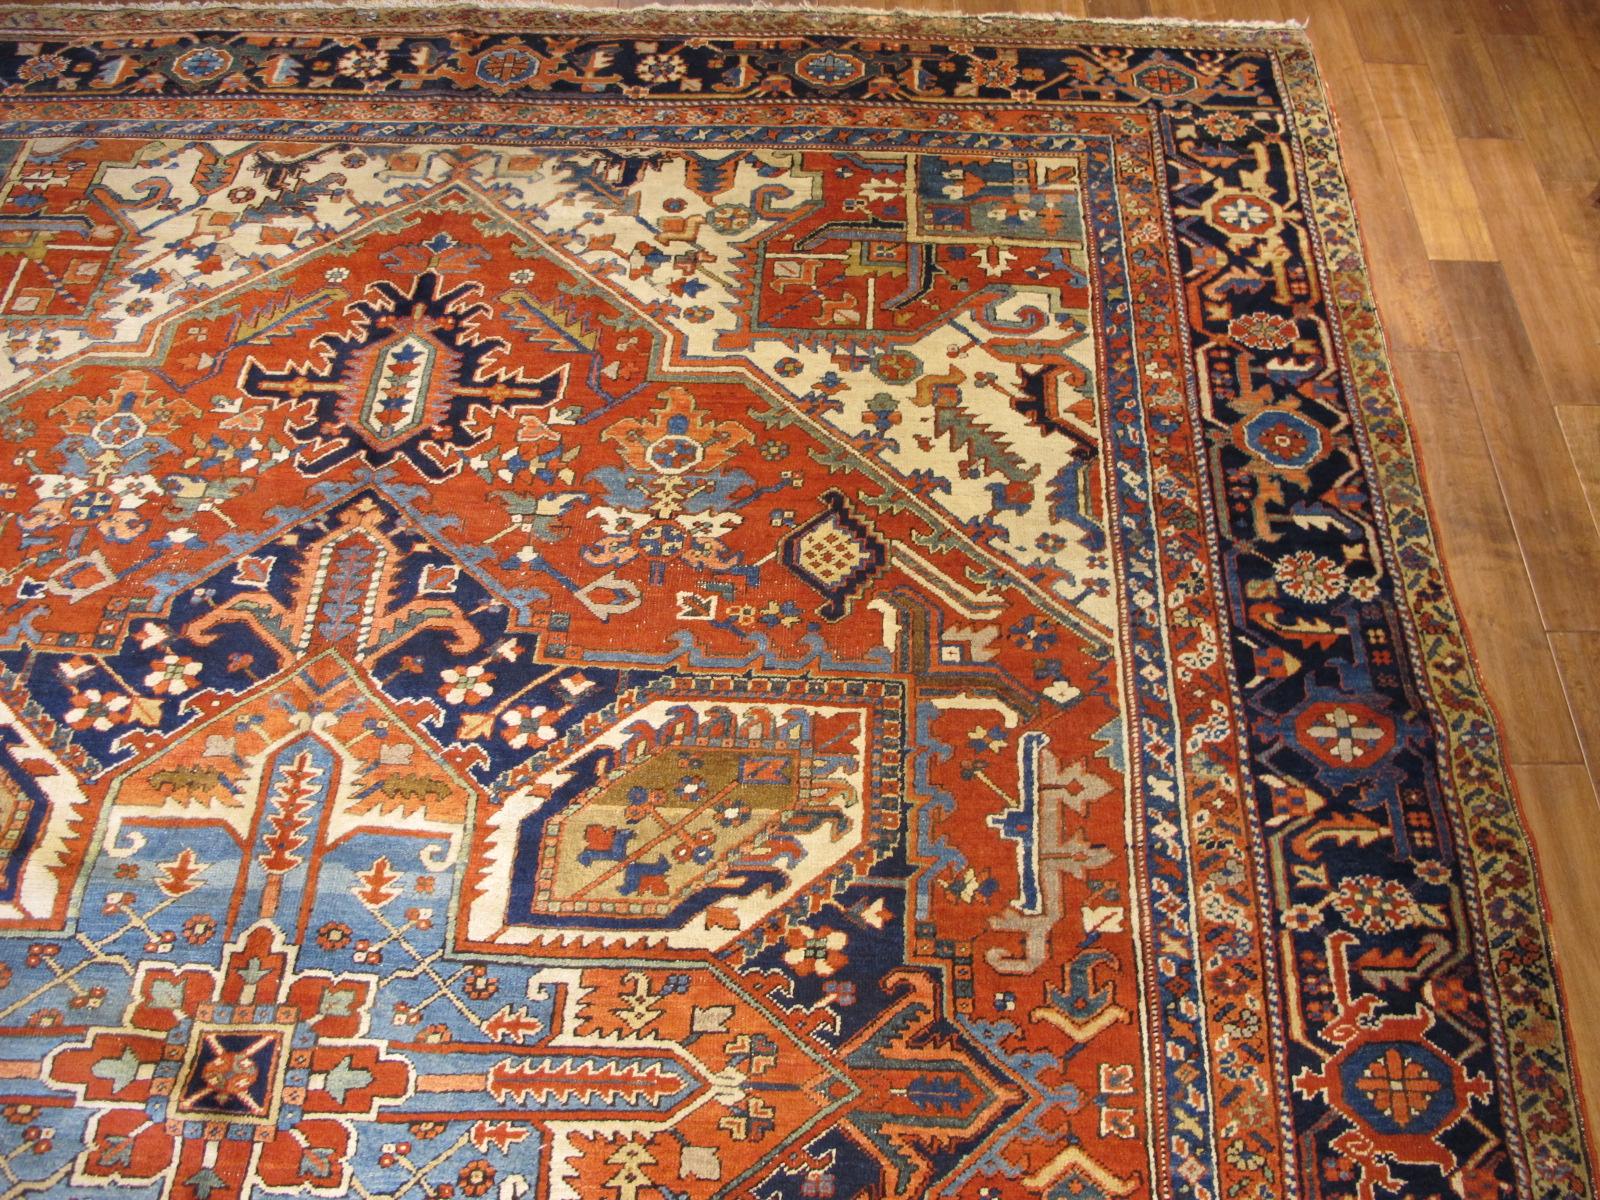 23680 Persian Heriz rug 10 x 13 (3)